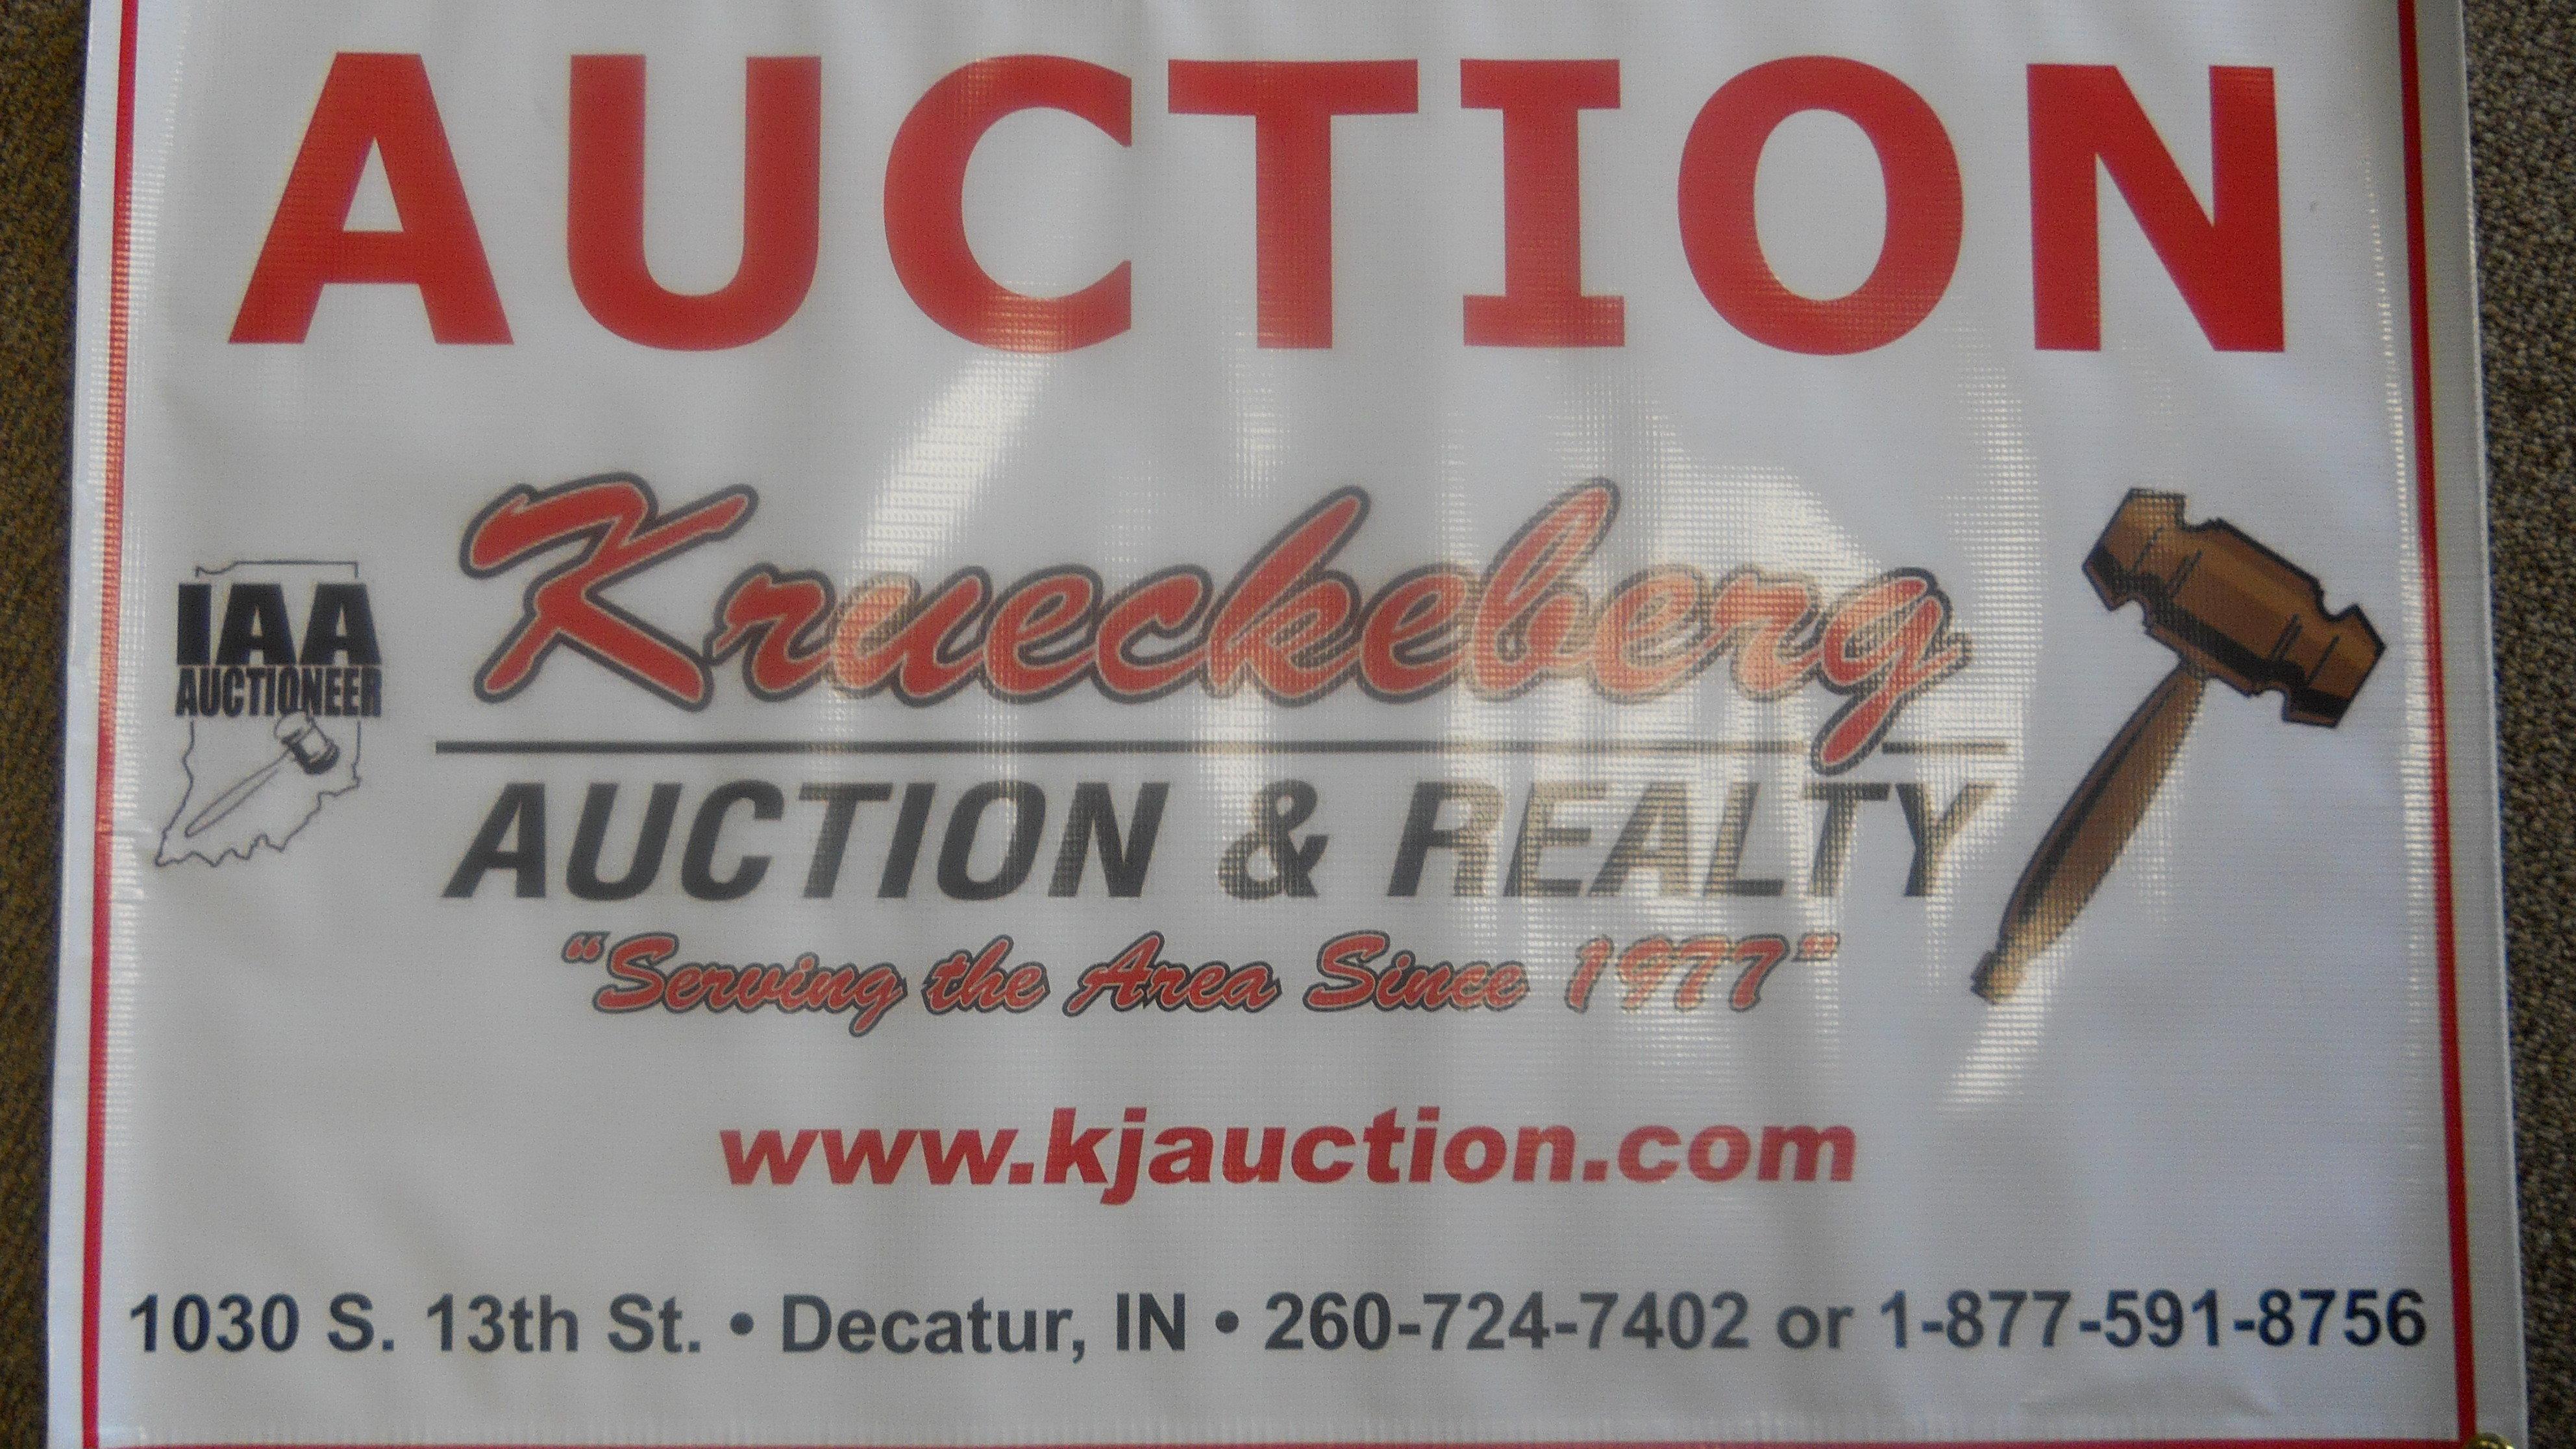 Krueckeberg Auction & Realty LLC